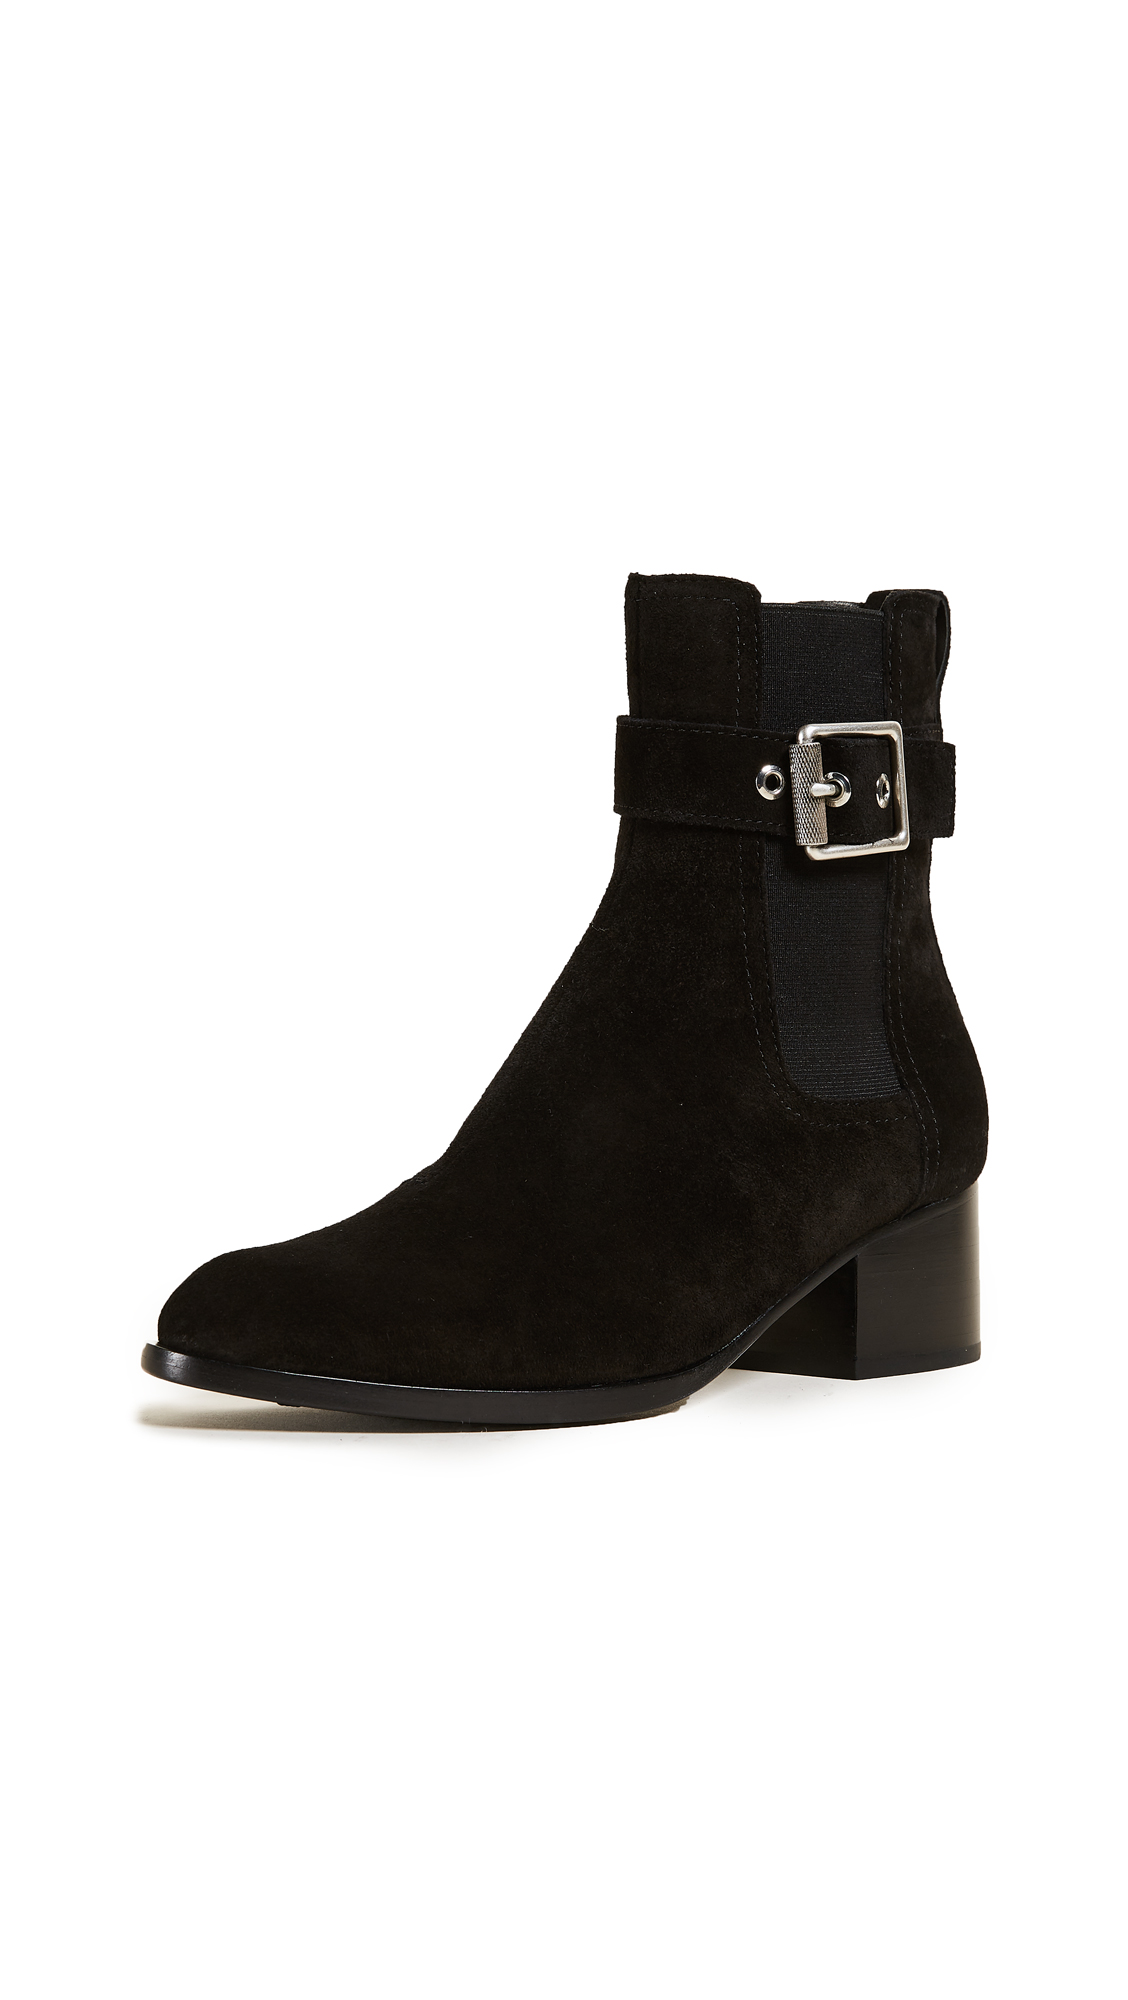 Rag & Bone Wilson Boots - Black